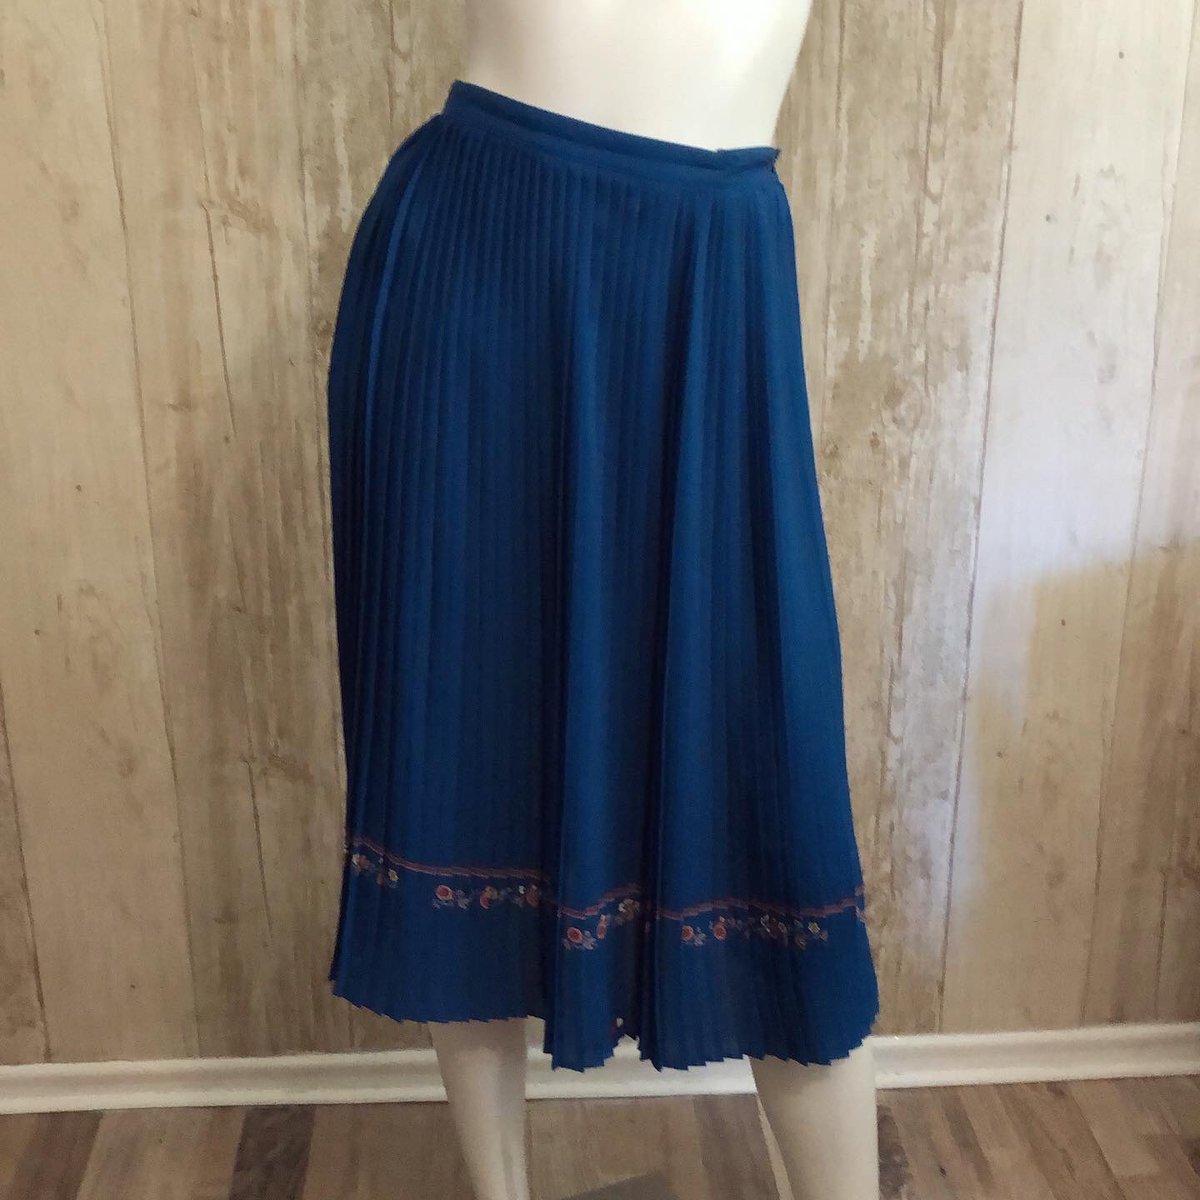 "Dark teal 100% silk pleated skirt. The colour is fantastic!  waist: 25"". Hips: 35"". Length: 28"".  Please message if interested #vintage #vintageclothing #vintageclothingforsale #vintagefashion #vintageskirt #pleatedskirt #silkskirt #prettyskirt #darktealskirtpic.twitter.com/crqe1oZkSy"